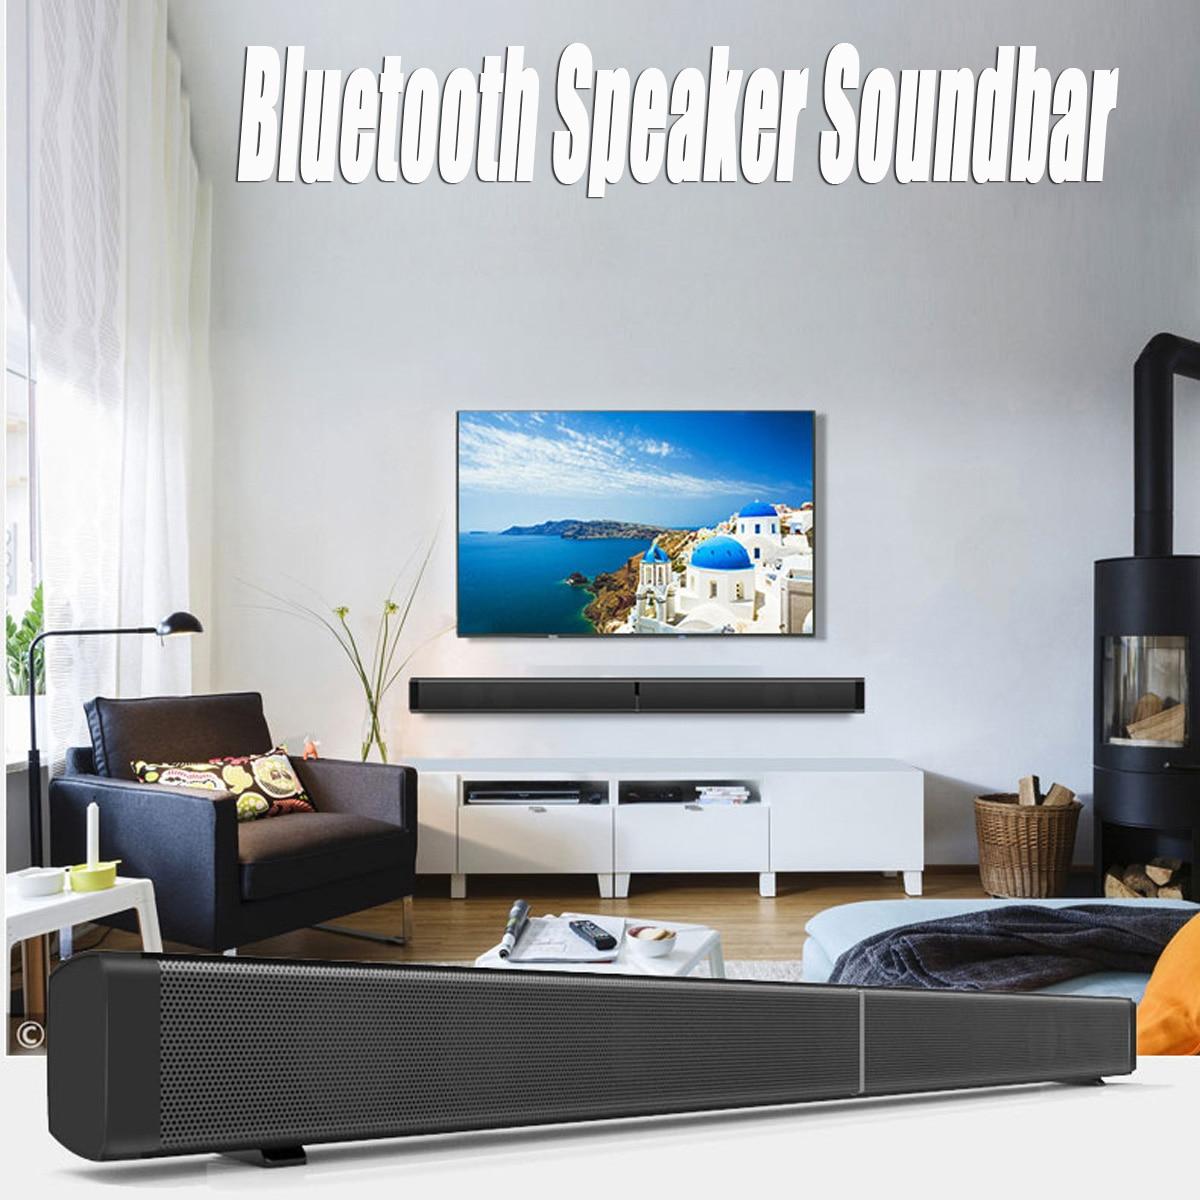 Sound Bar Home Theater System Soundbar Bluetooth Speaker Soundbar Super Bass soundbar lg sj4